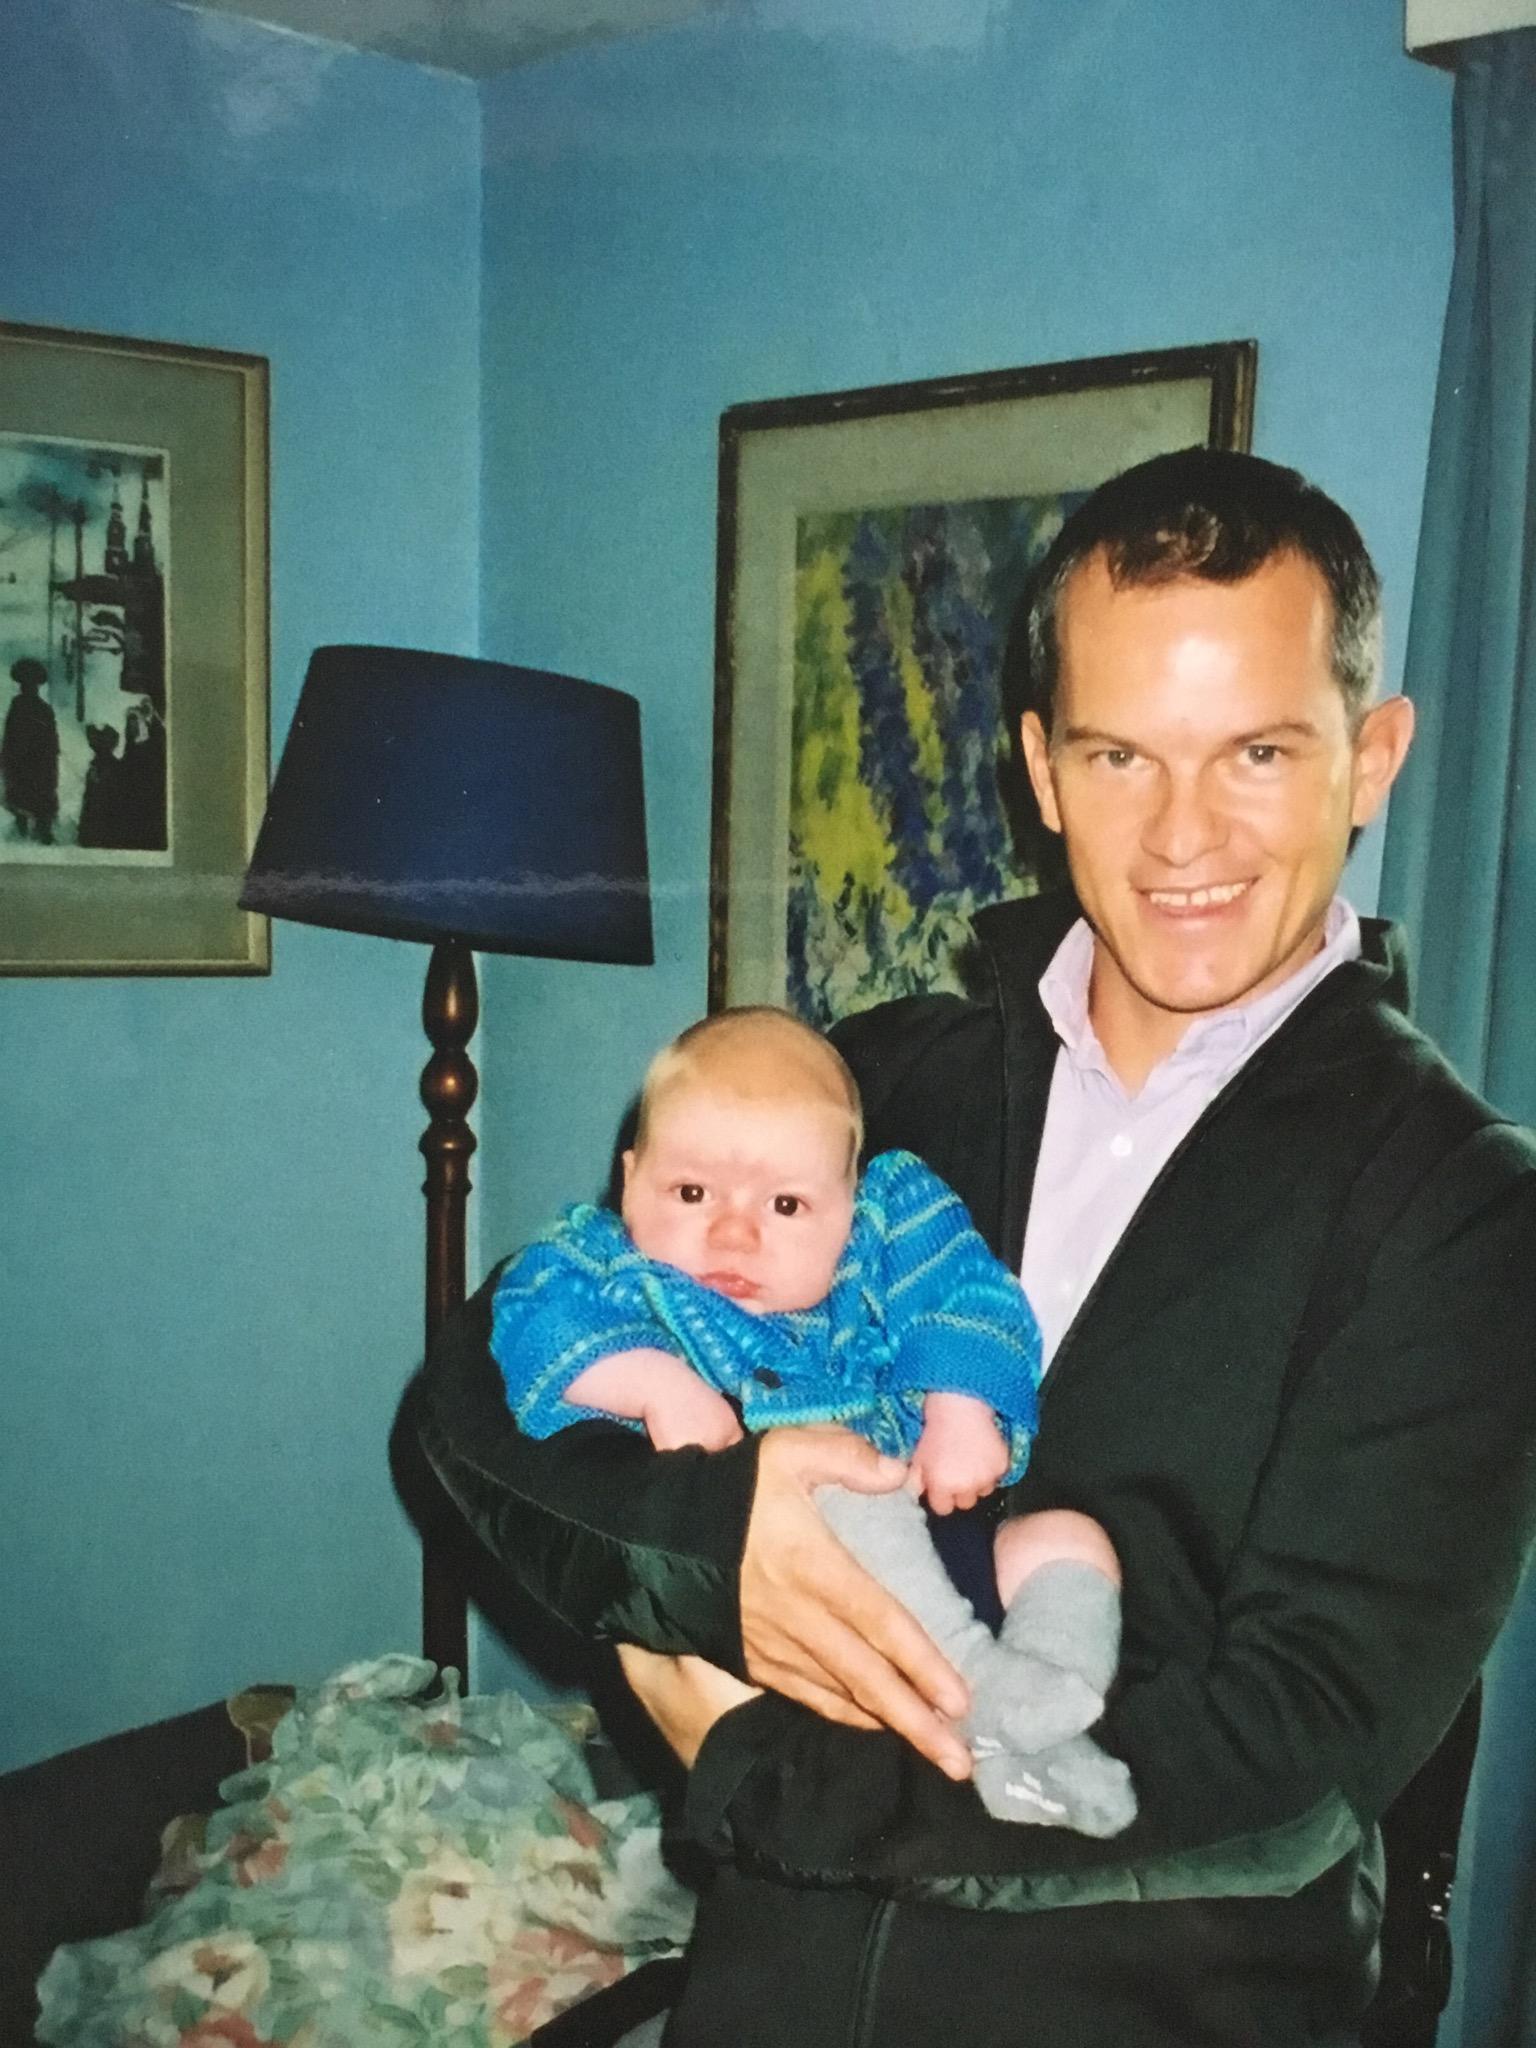 David and Alexander his godson, happier days